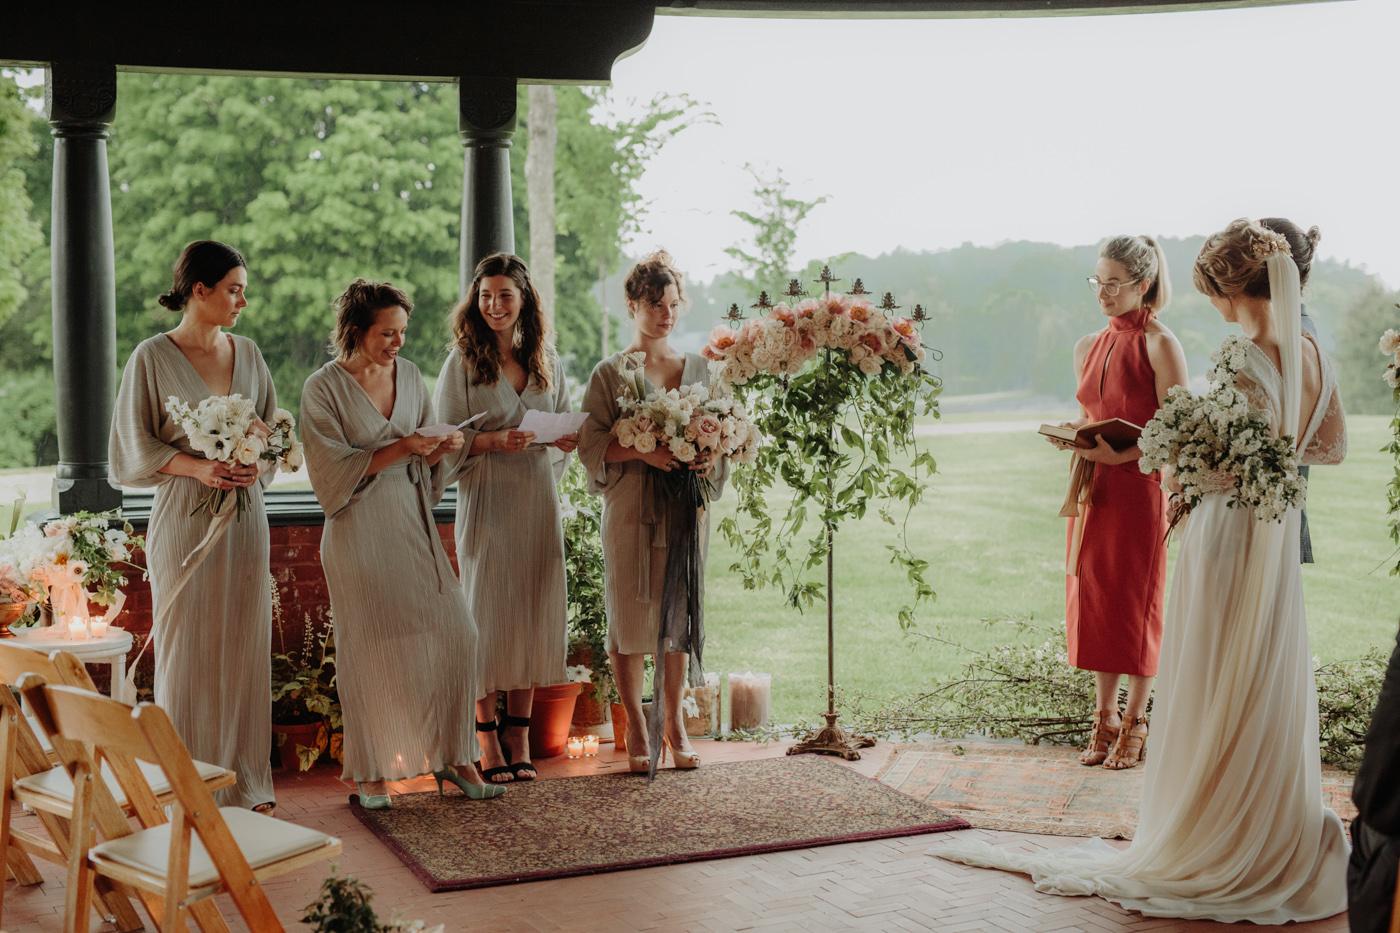 Erin-Mike-Intimate-Vintage-Wedding-Shelburne-Farms-Vermont -84.jpg